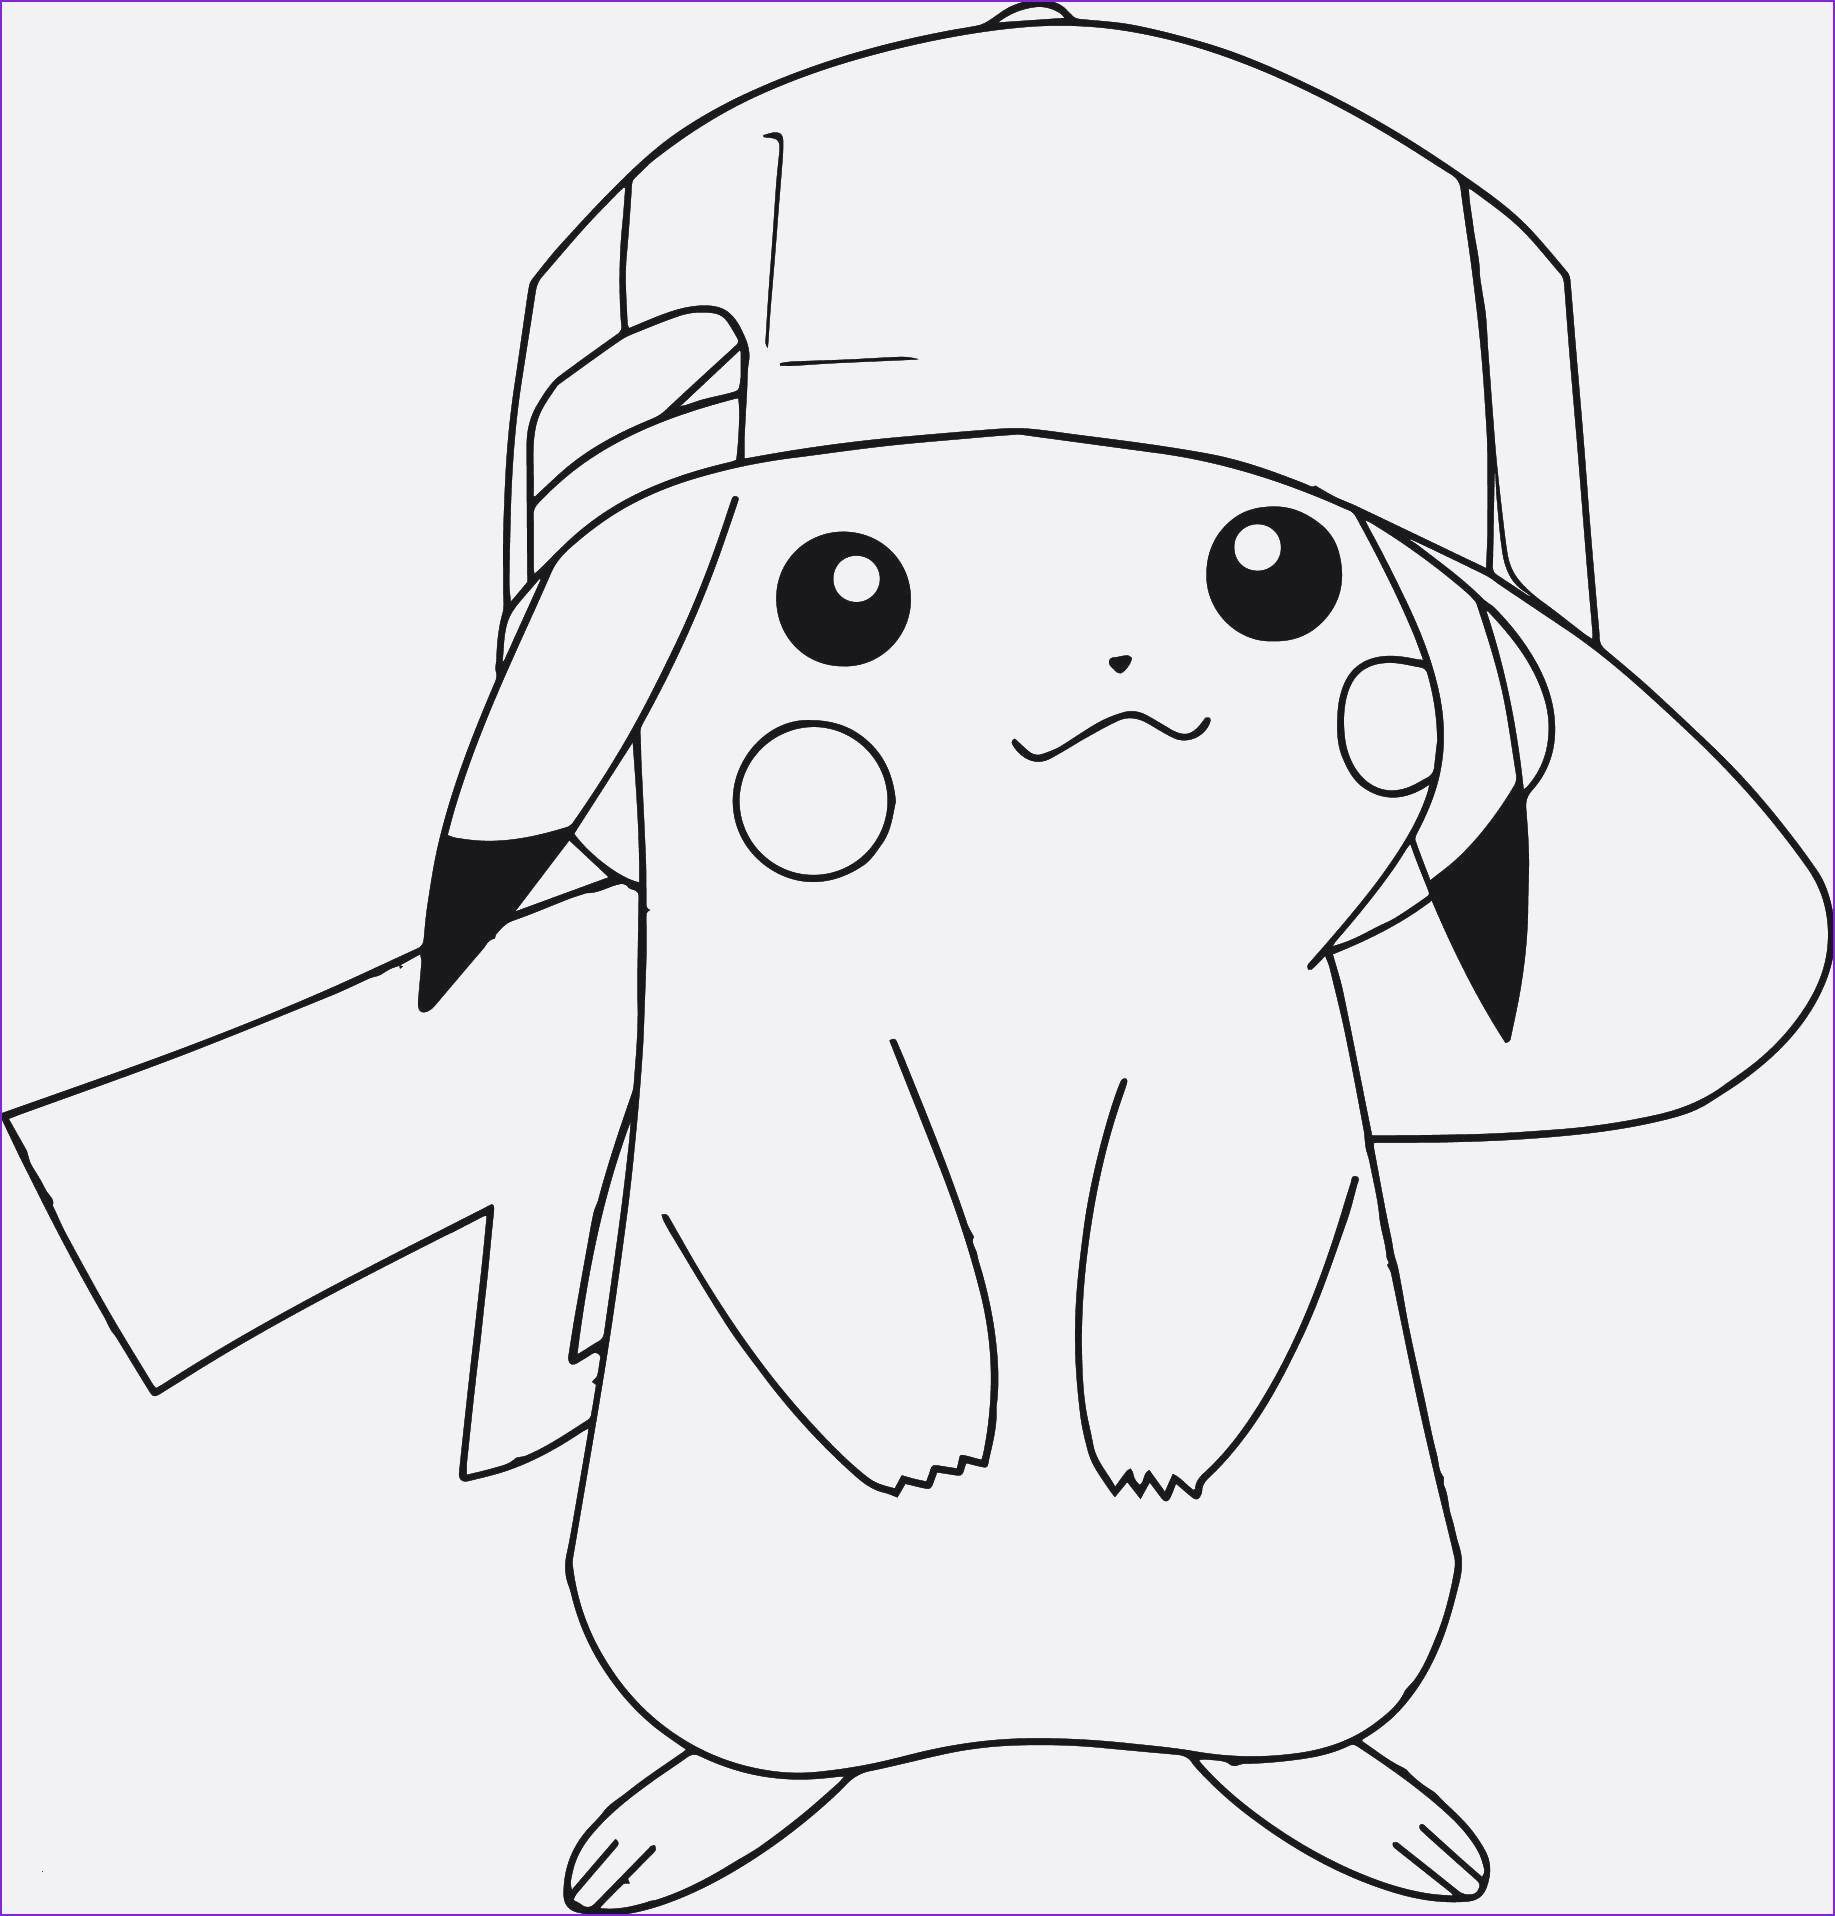 Ausmalbilder Pokemon Pikachu